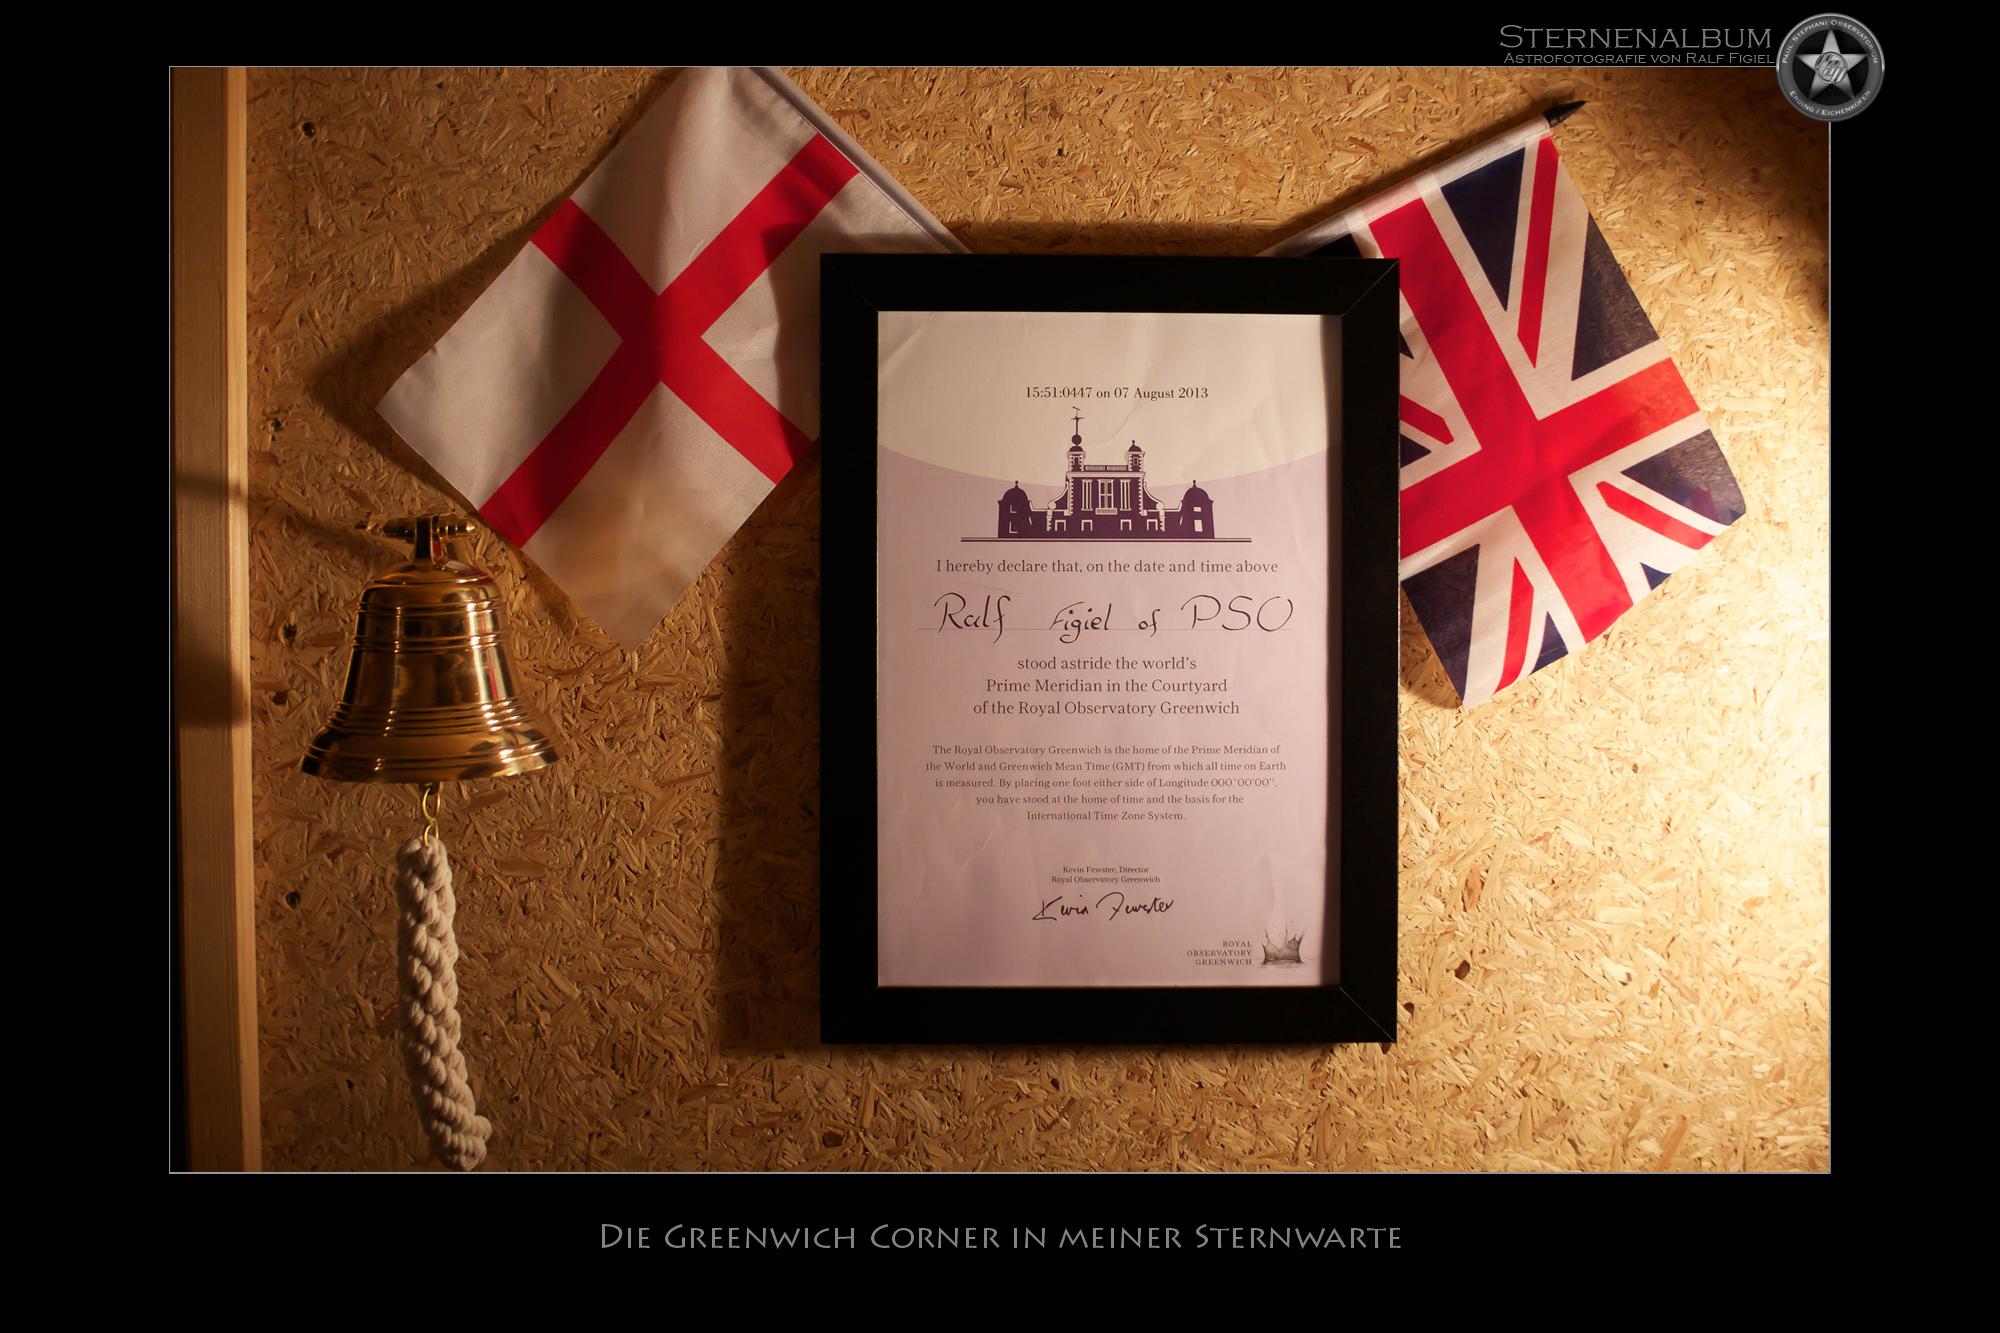 Greenwich Corner